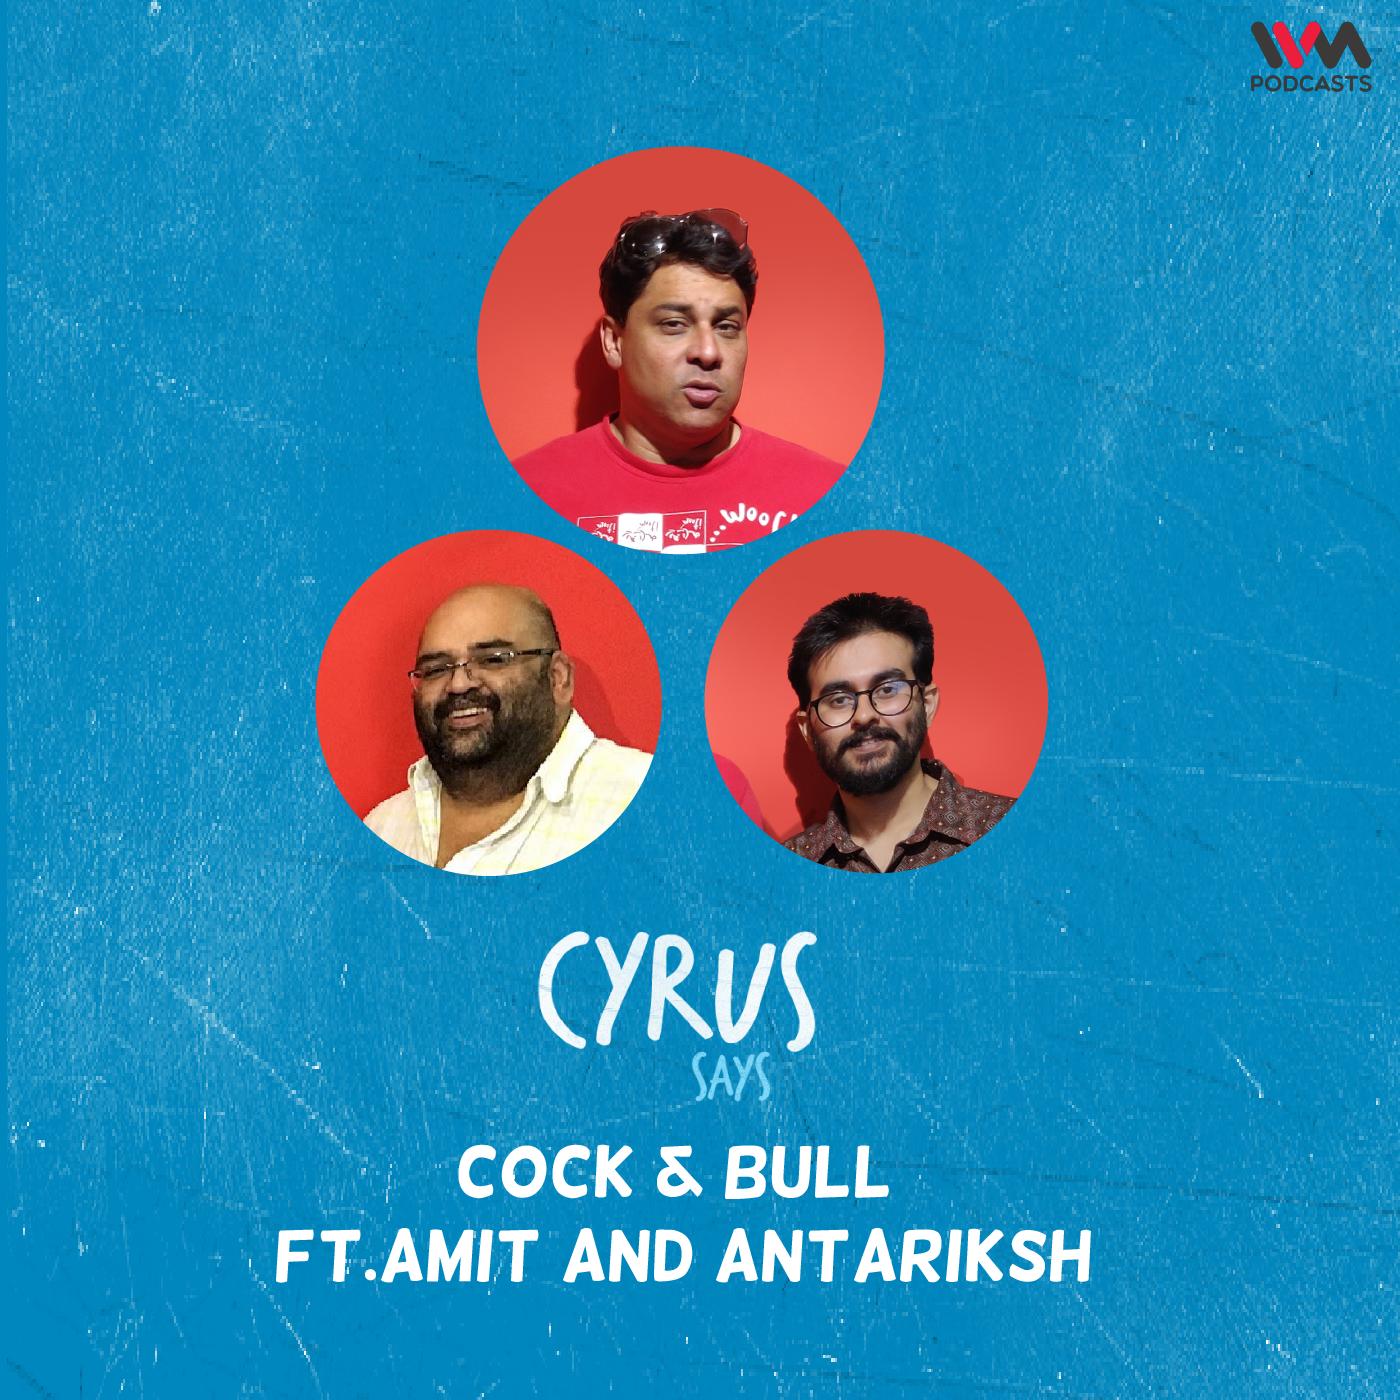 Ep. 688: Cock & Bull feat. Amit and Antariksh